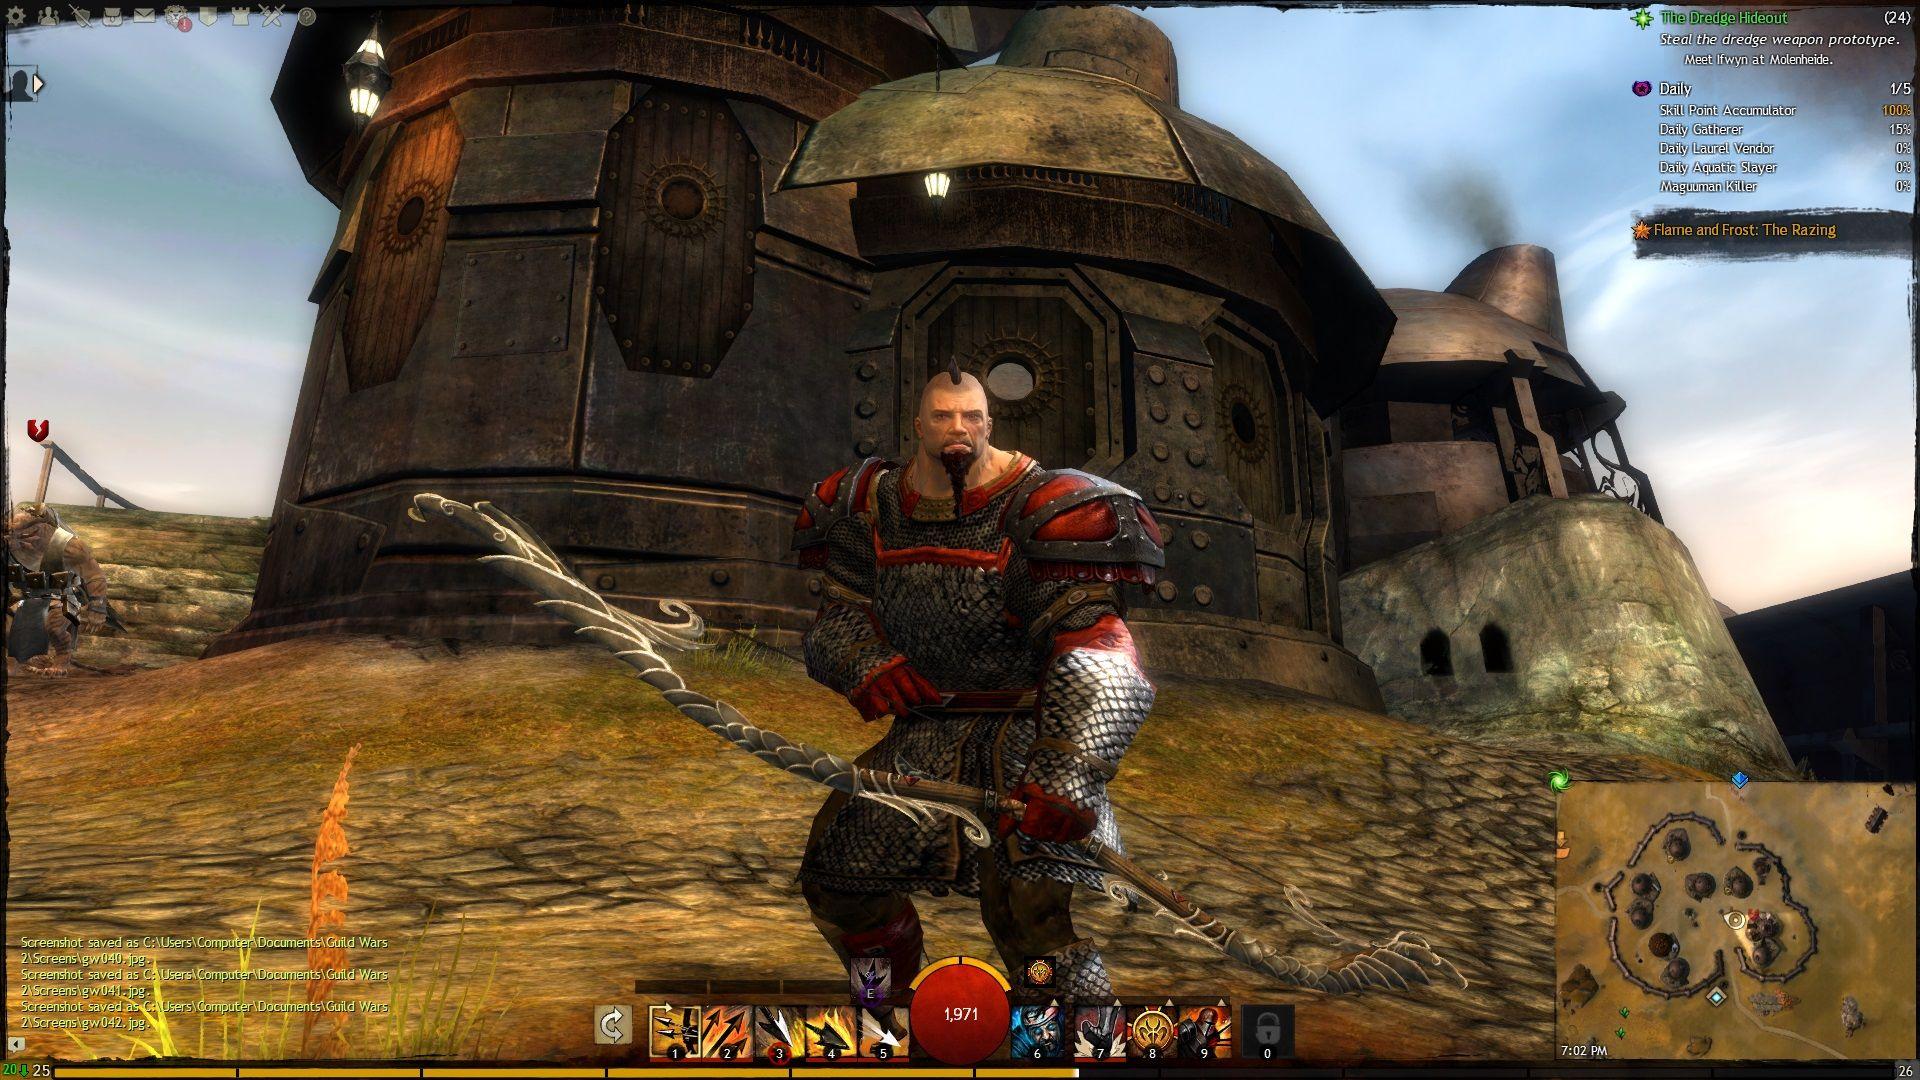 Name: Wrecking Ball Bob Race: Norn Class: Warrior | My Guild